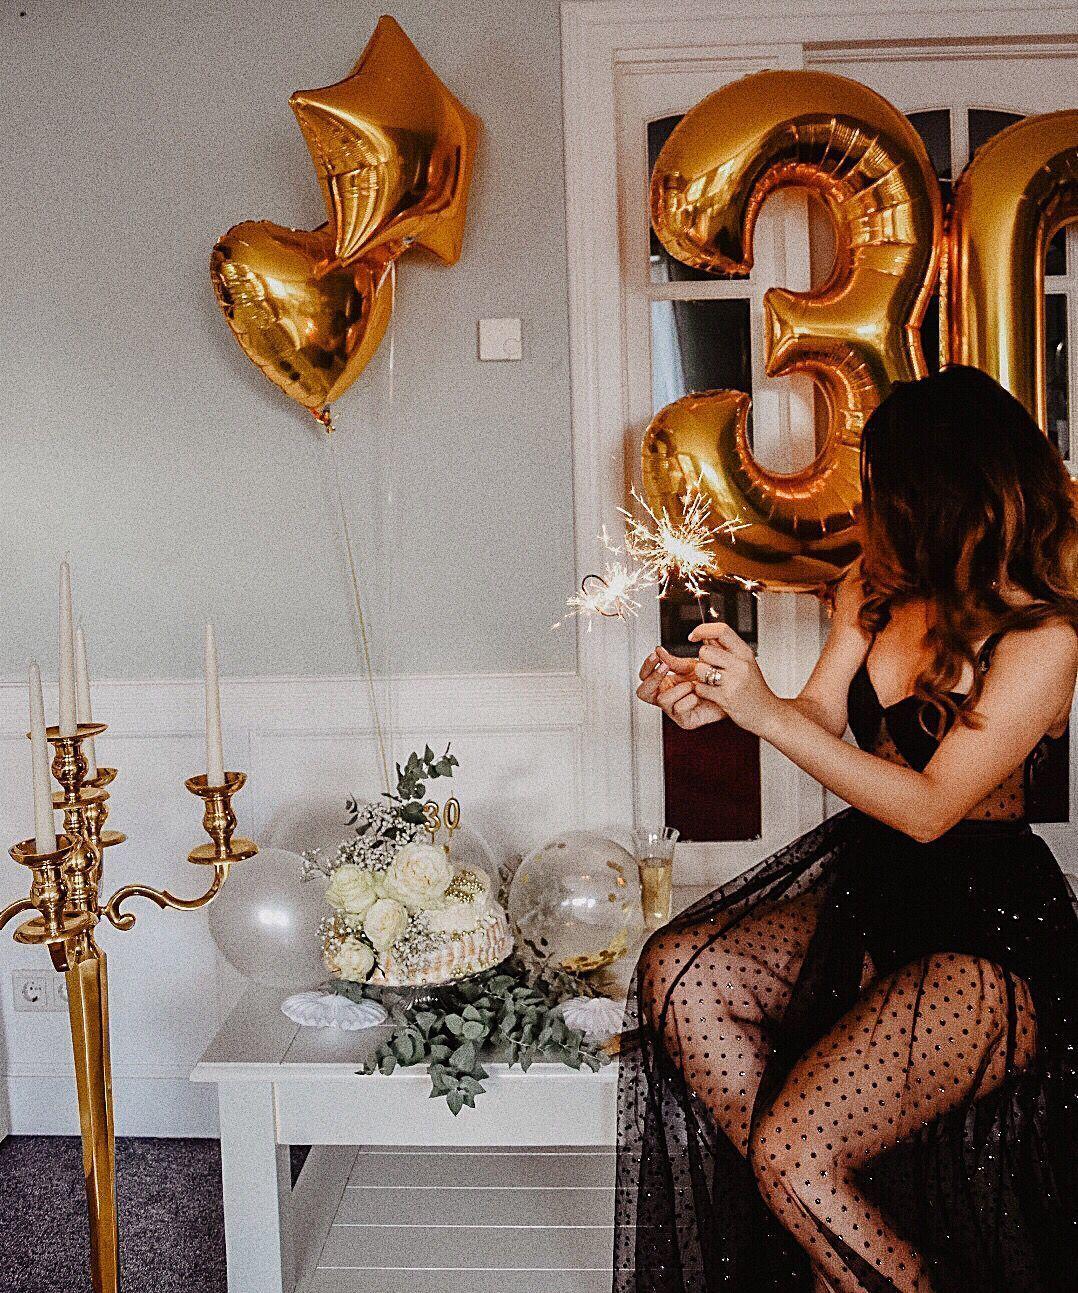 30th birthday ideas for women in 2020 30th birthday